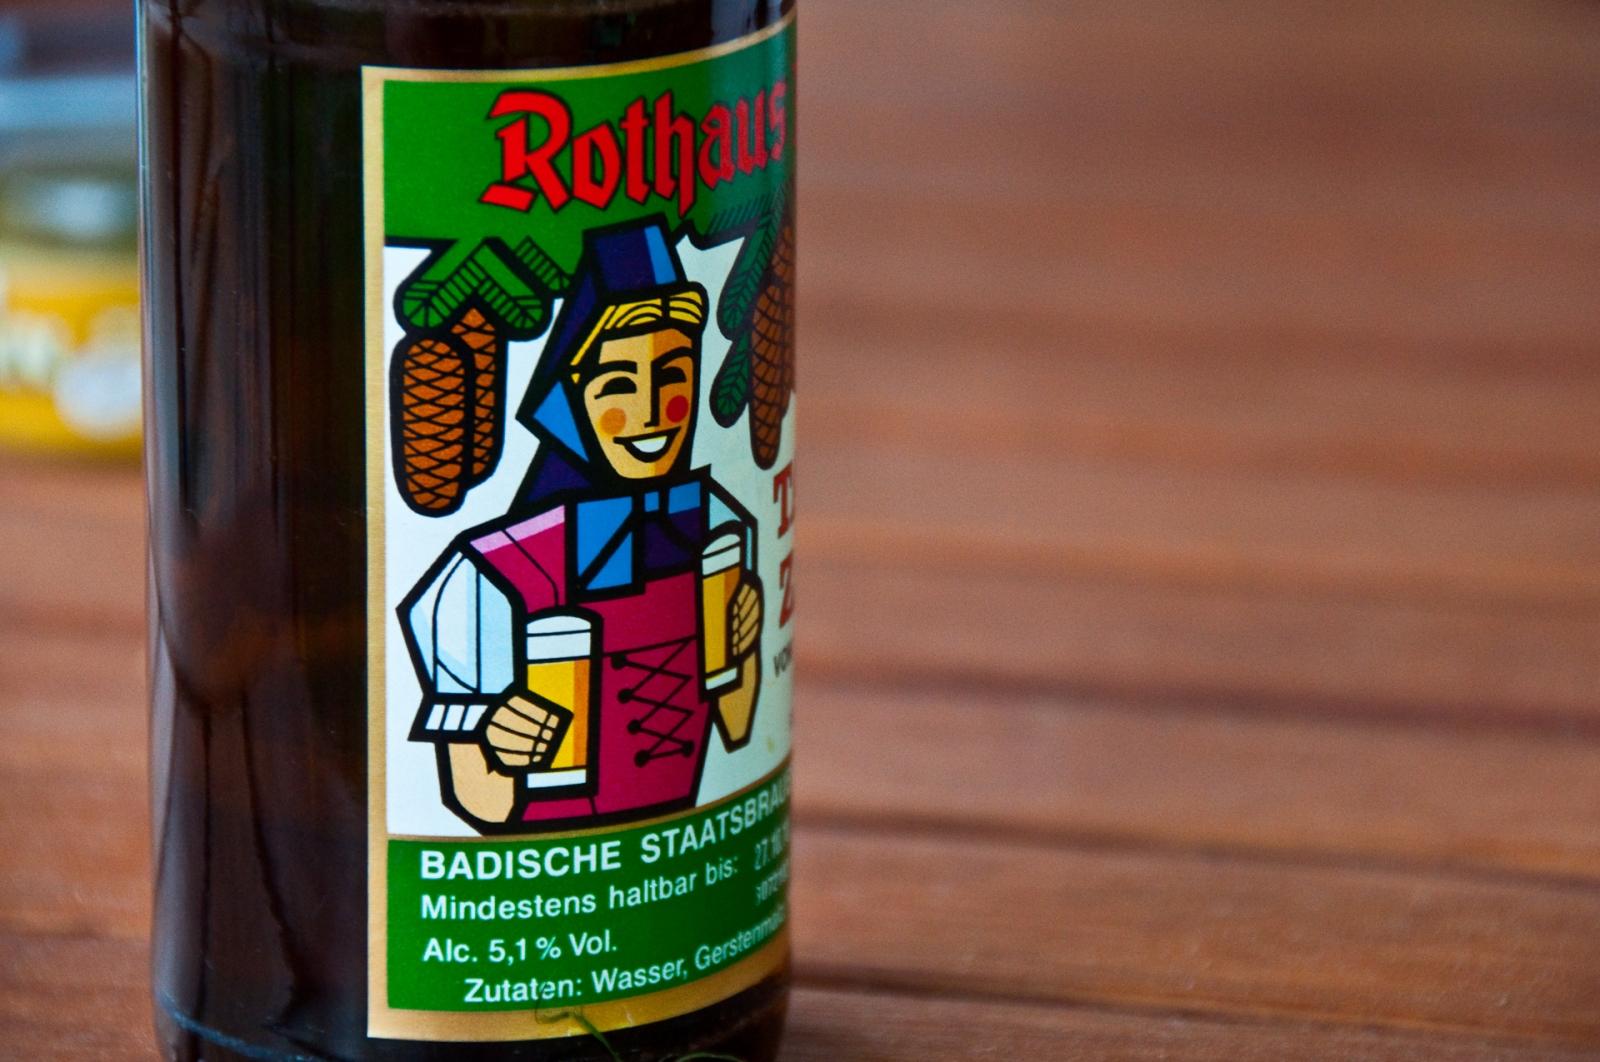 rothaus flaska öl beer bottle